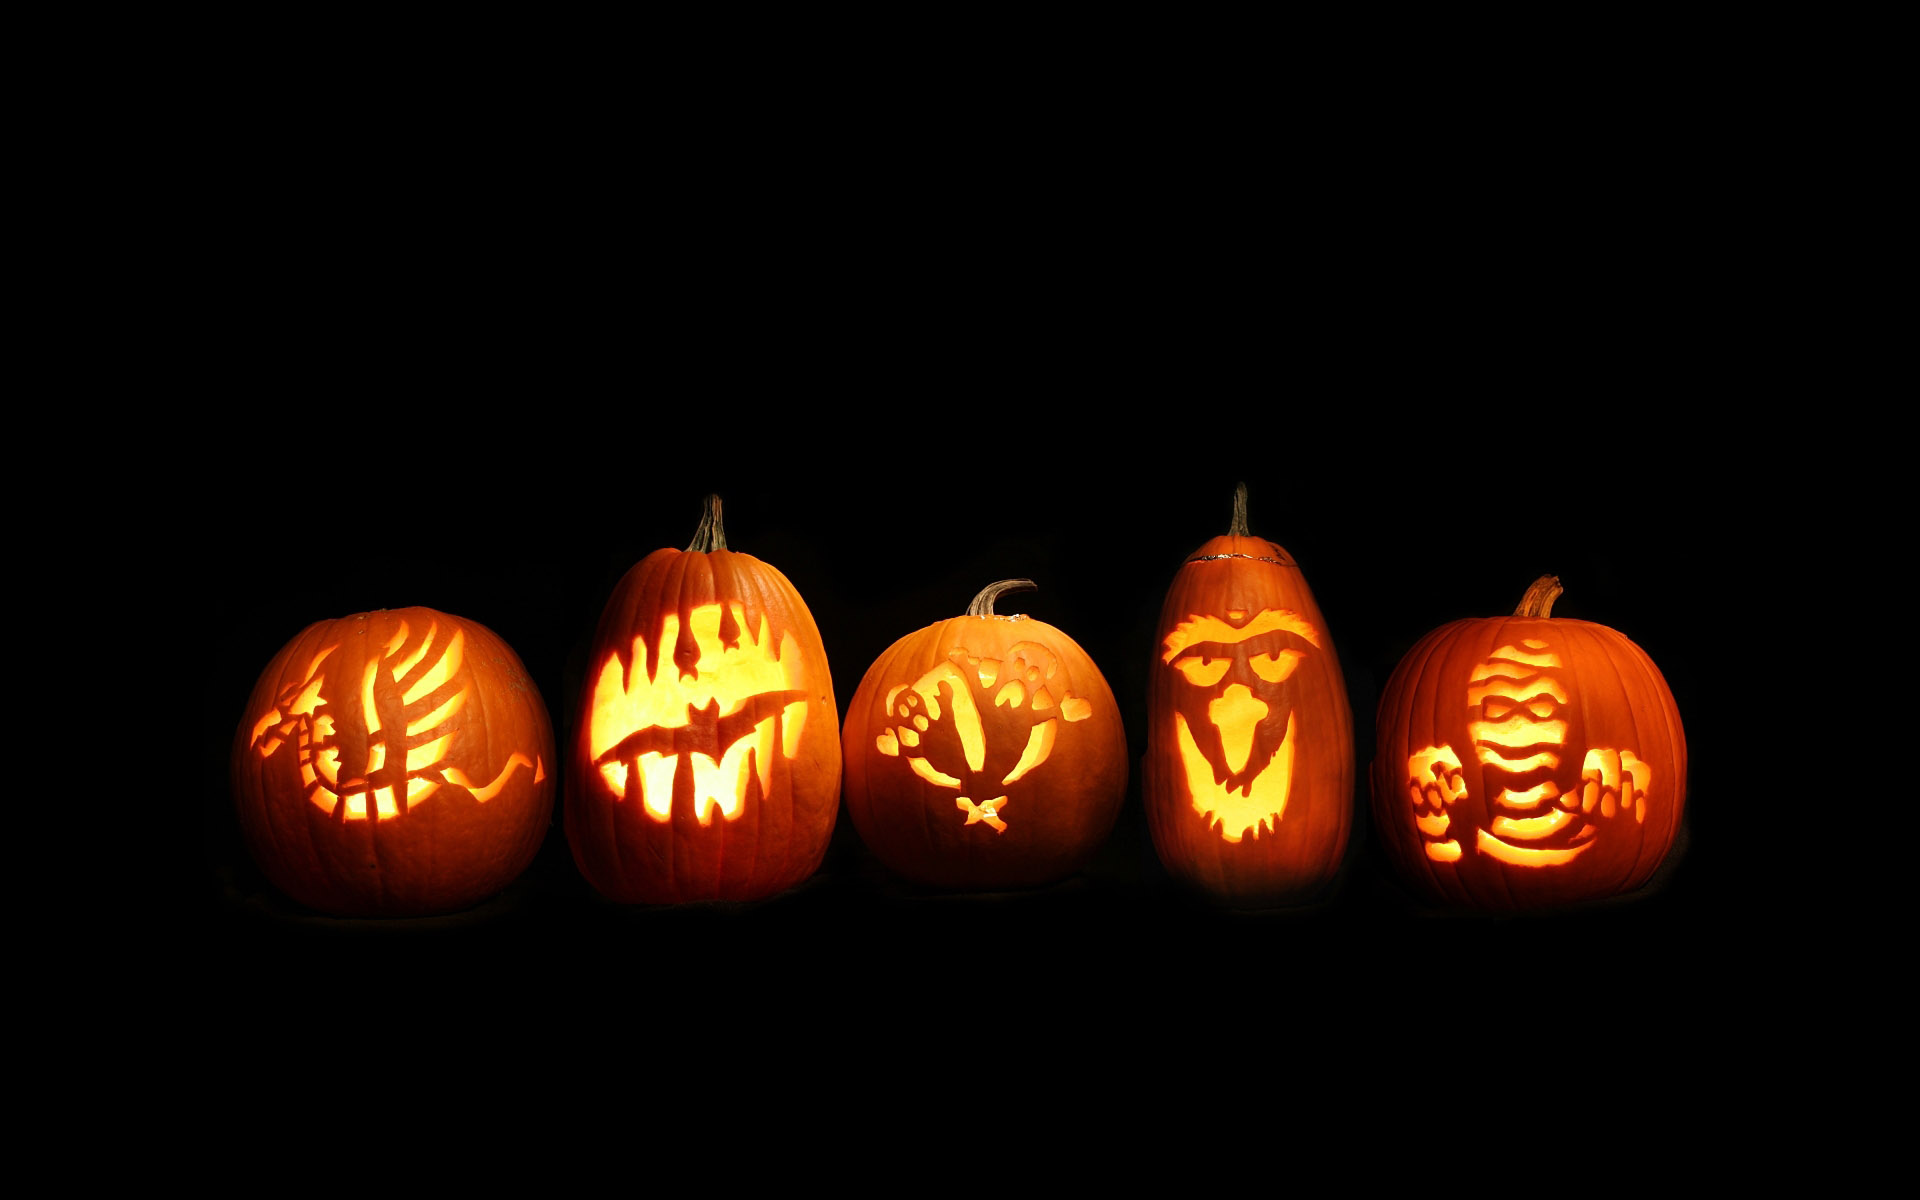 Calabazas de Halloween - 1920x1200